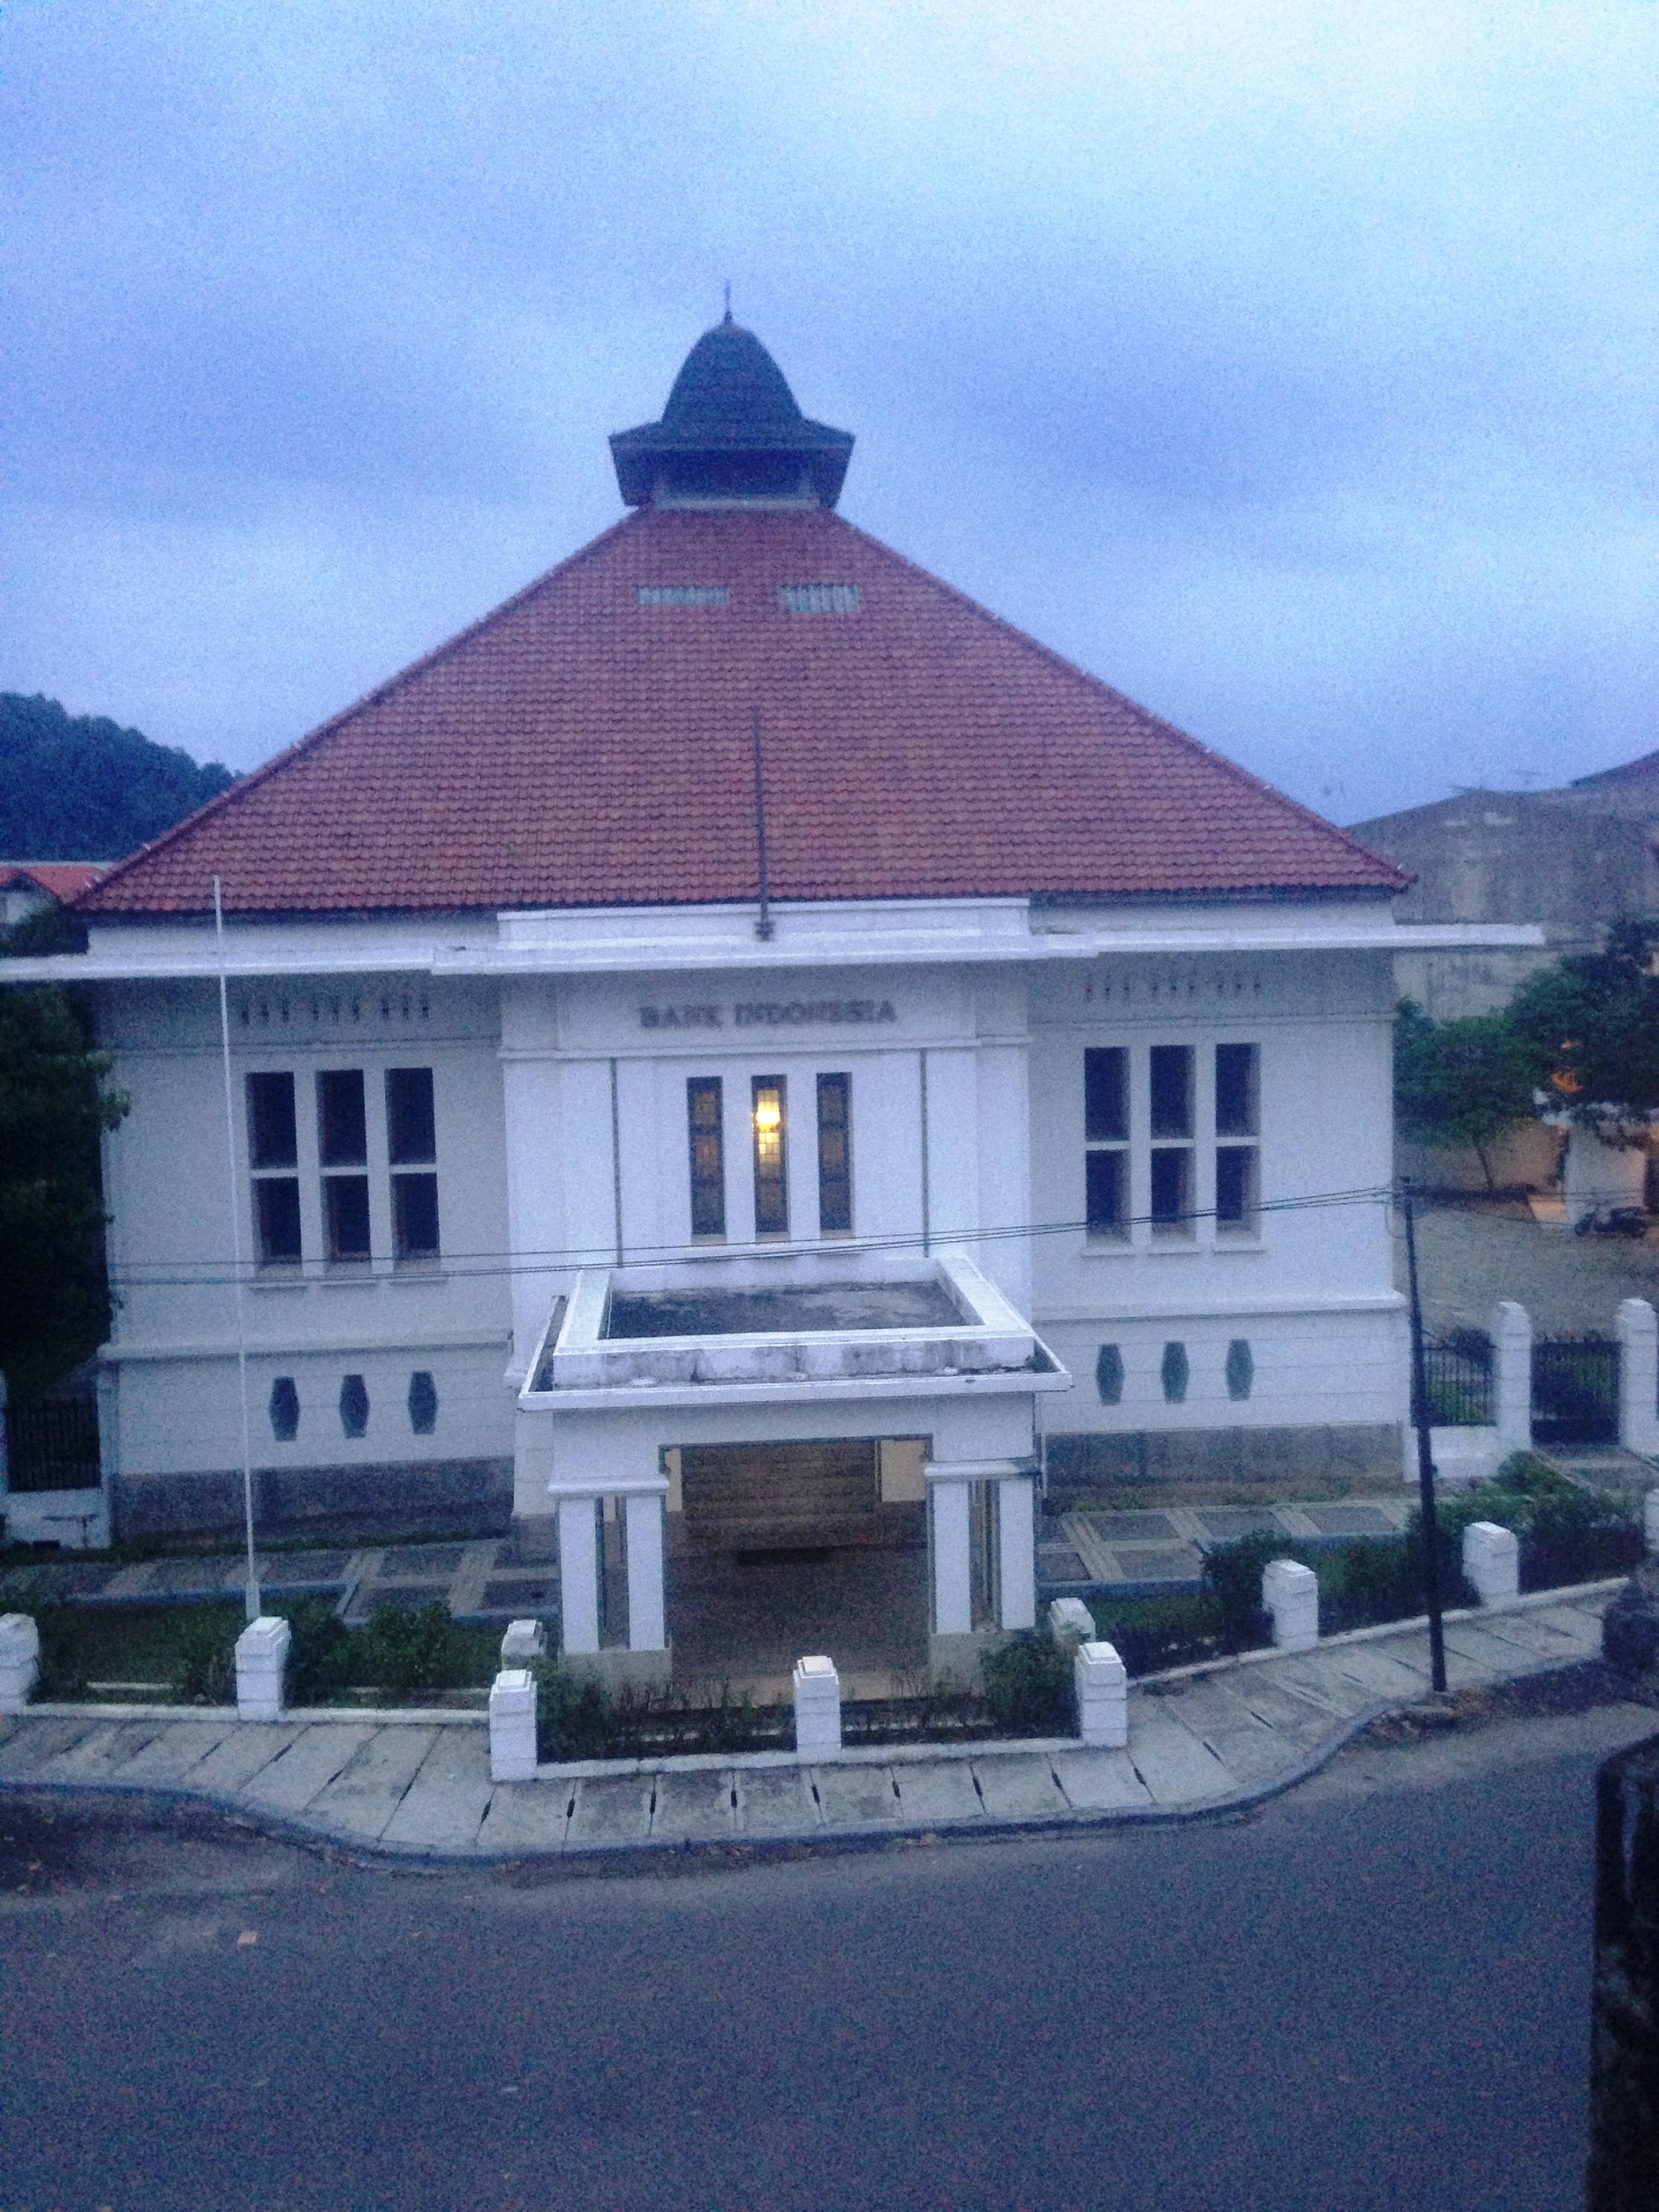 Jembatan Siti Nurbaya Kisahku Berada Daerah Kota Tua Pecinan Padang